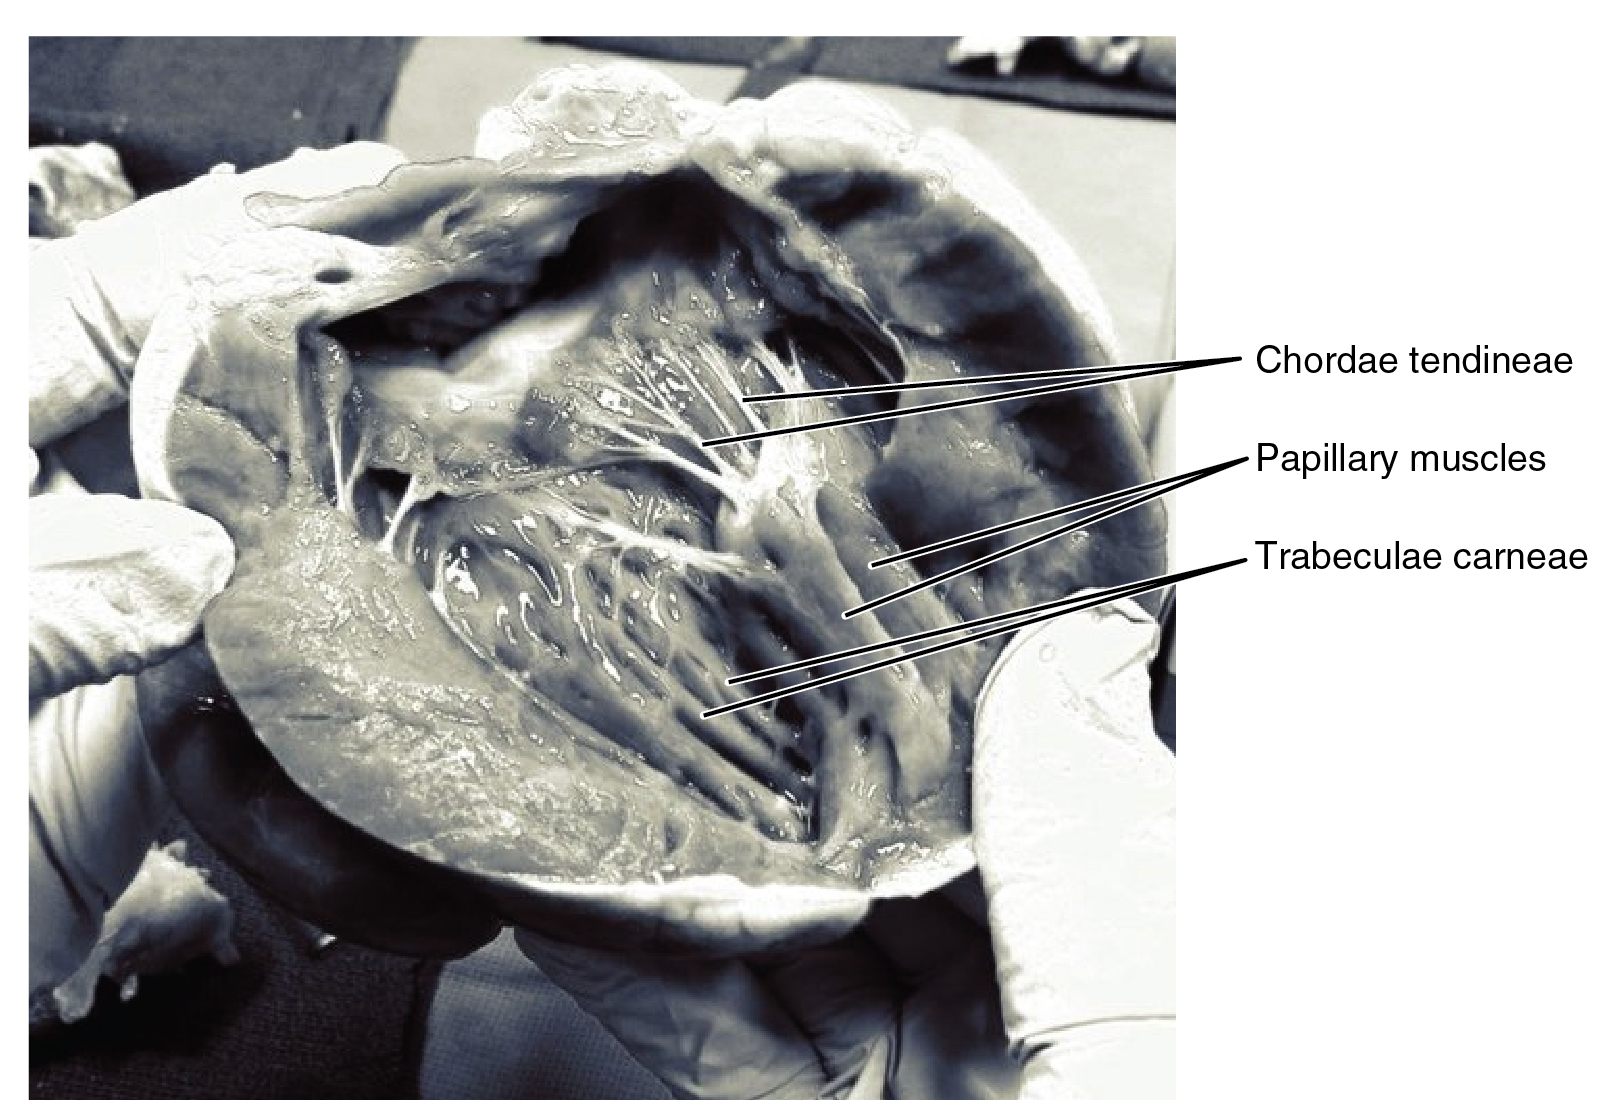 Heart Anatomy Anatomy And Physiology